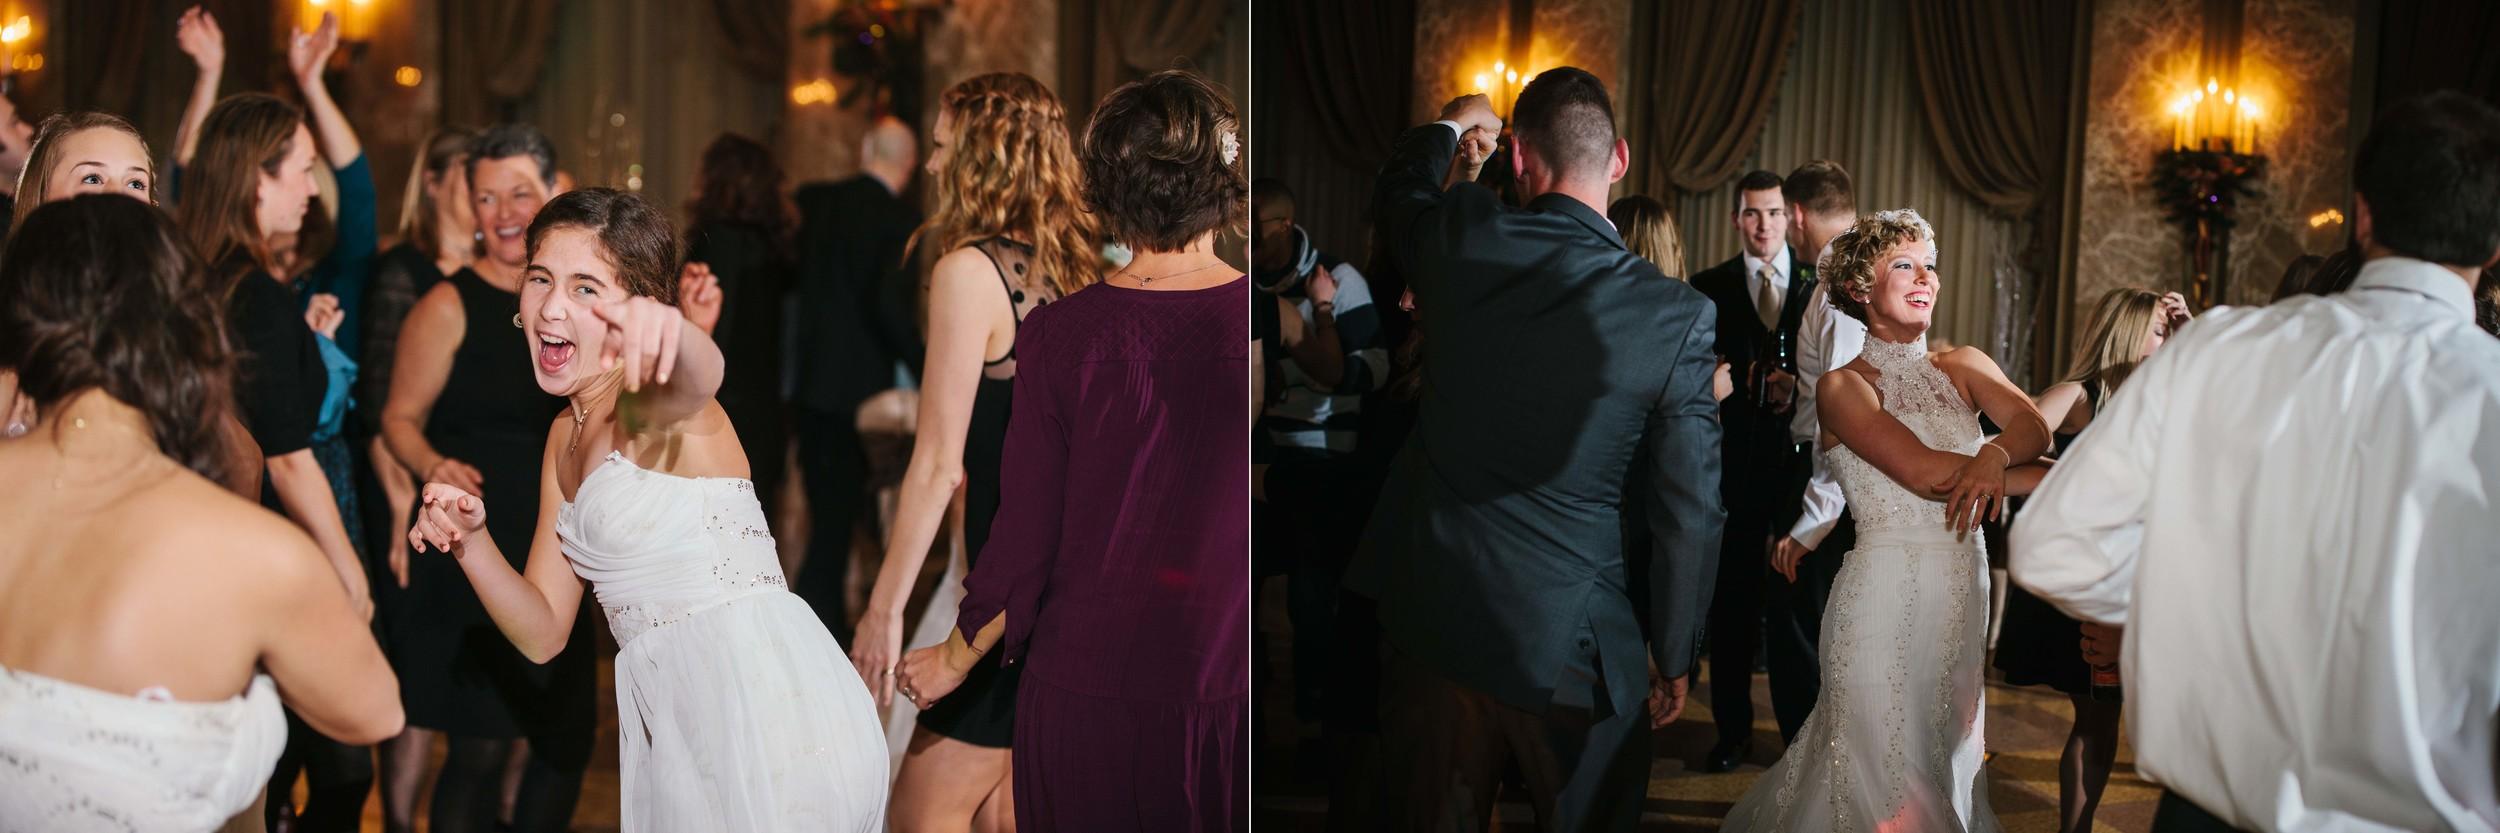 St Louis Wedding Photography-1095 copy.jpg